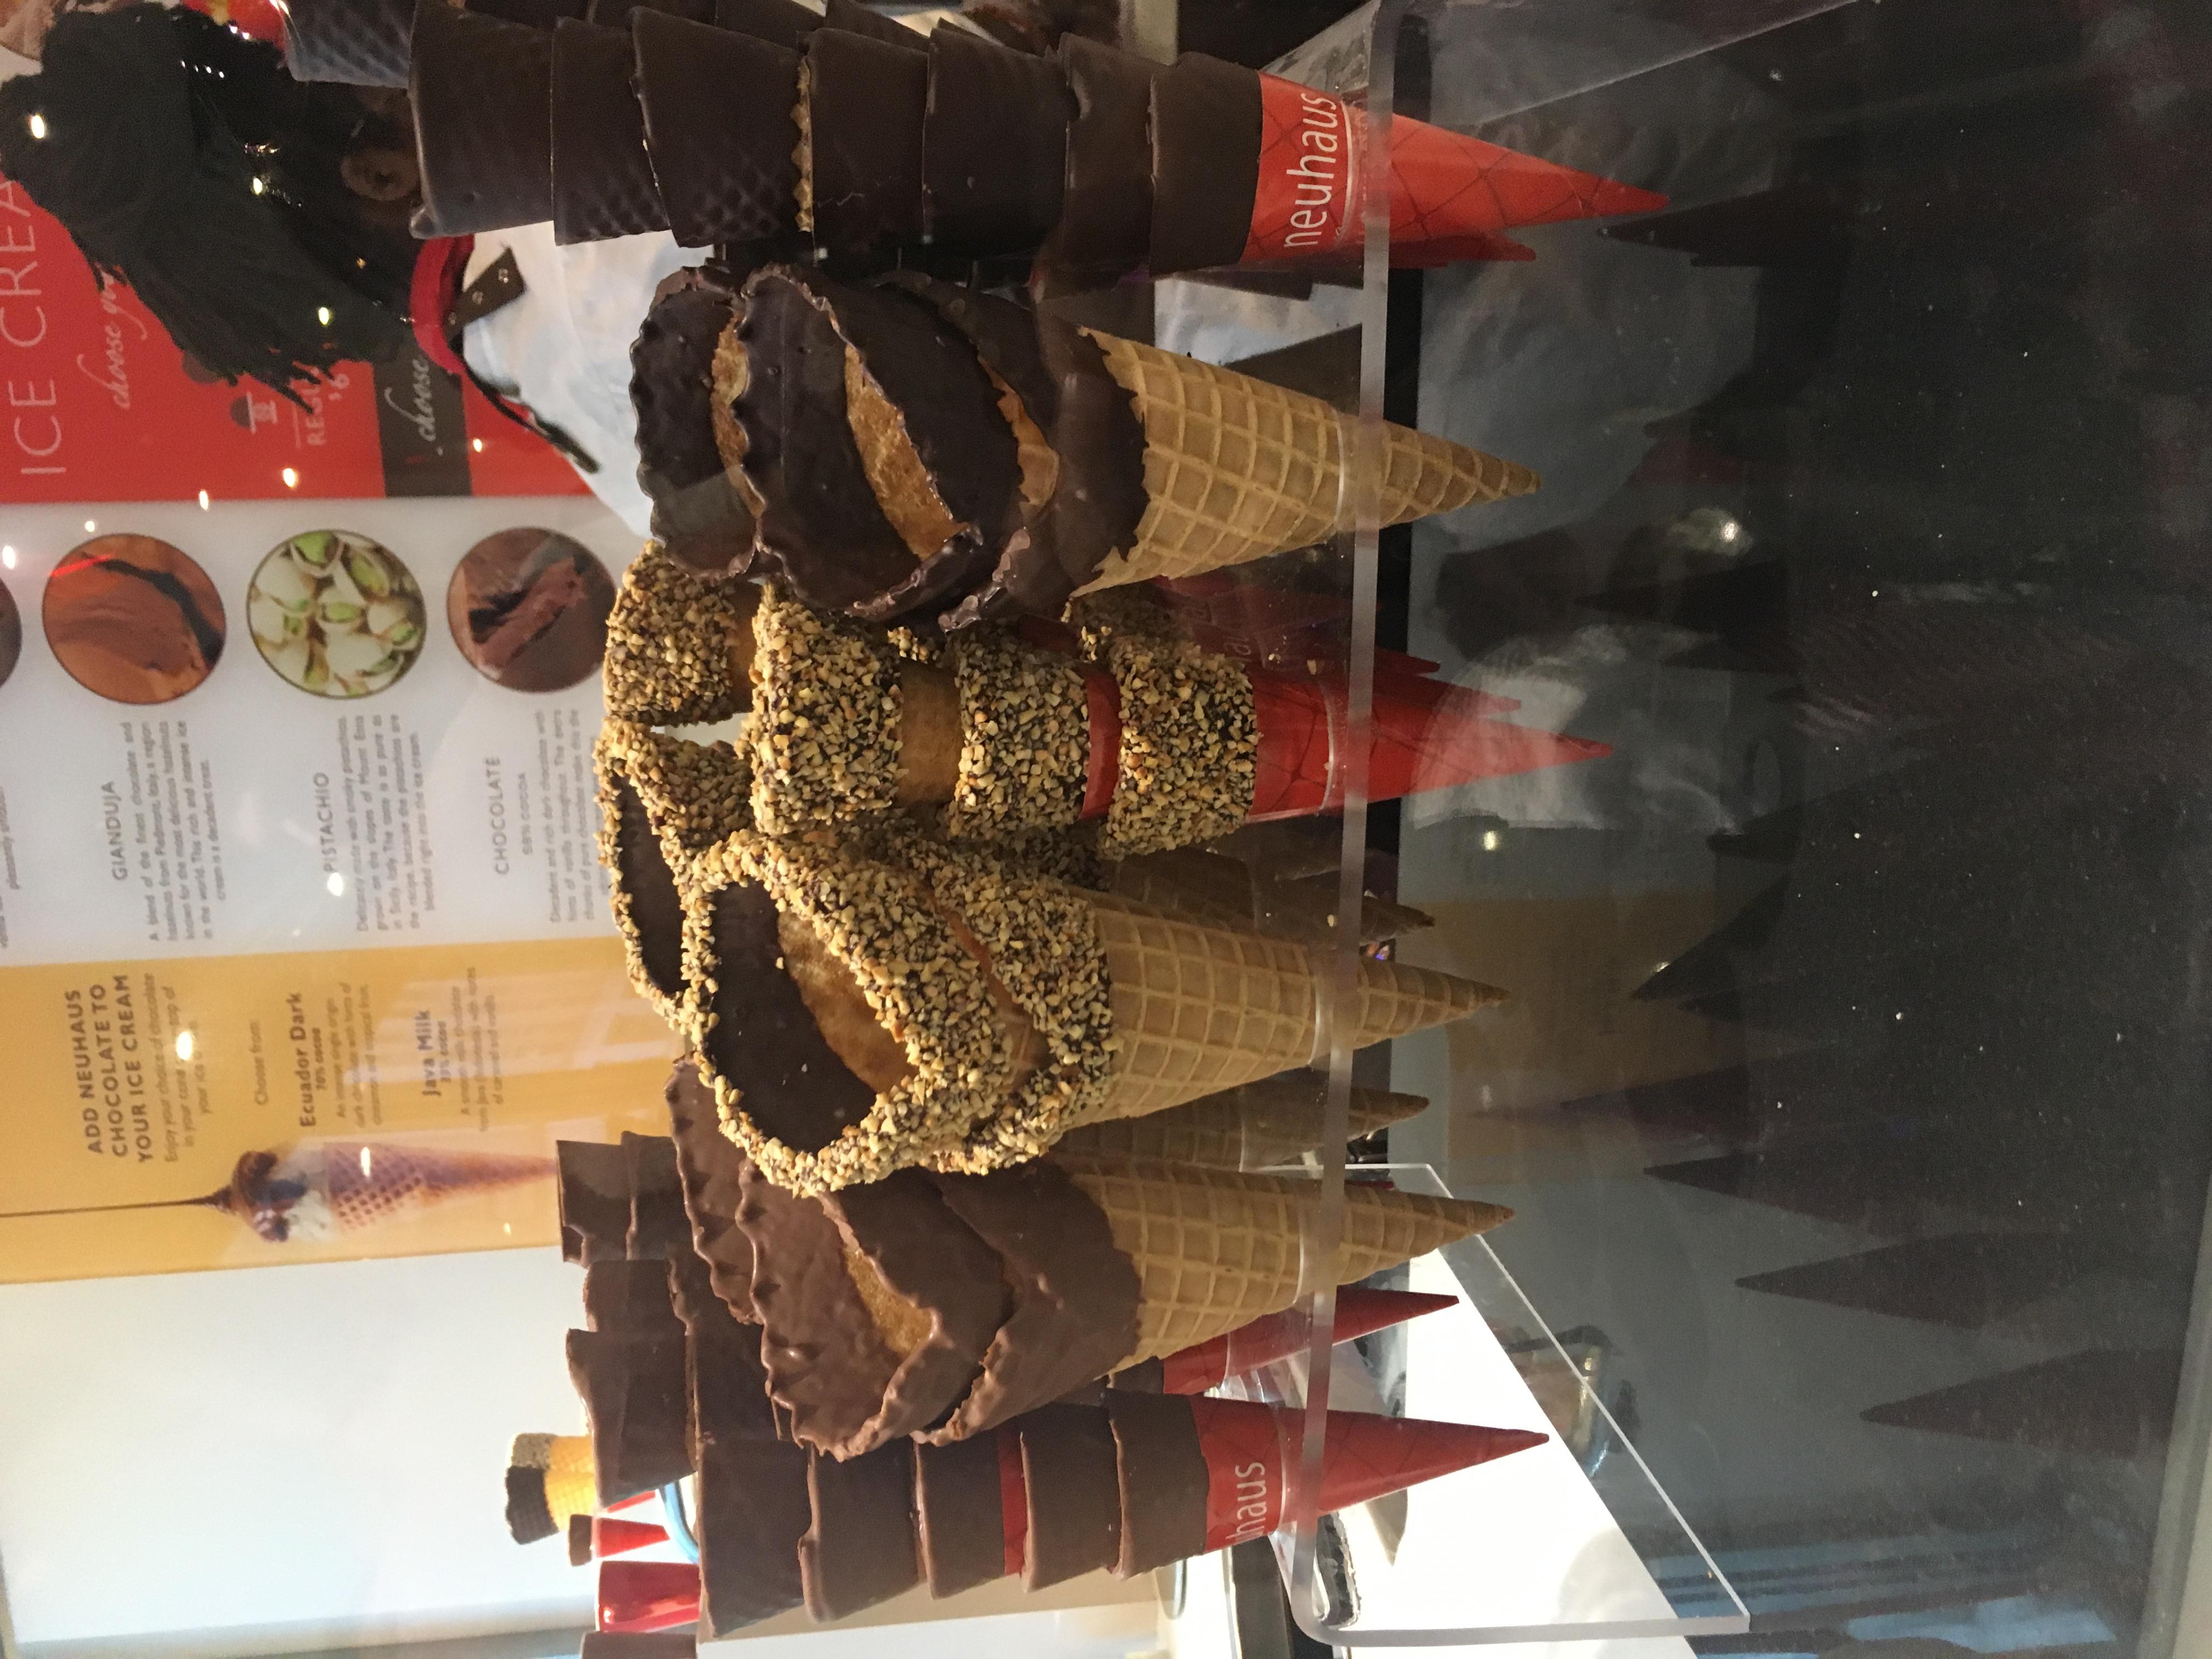 Downtown Celebrates National Ice Cream Day at Neuhaus - Downtown ...